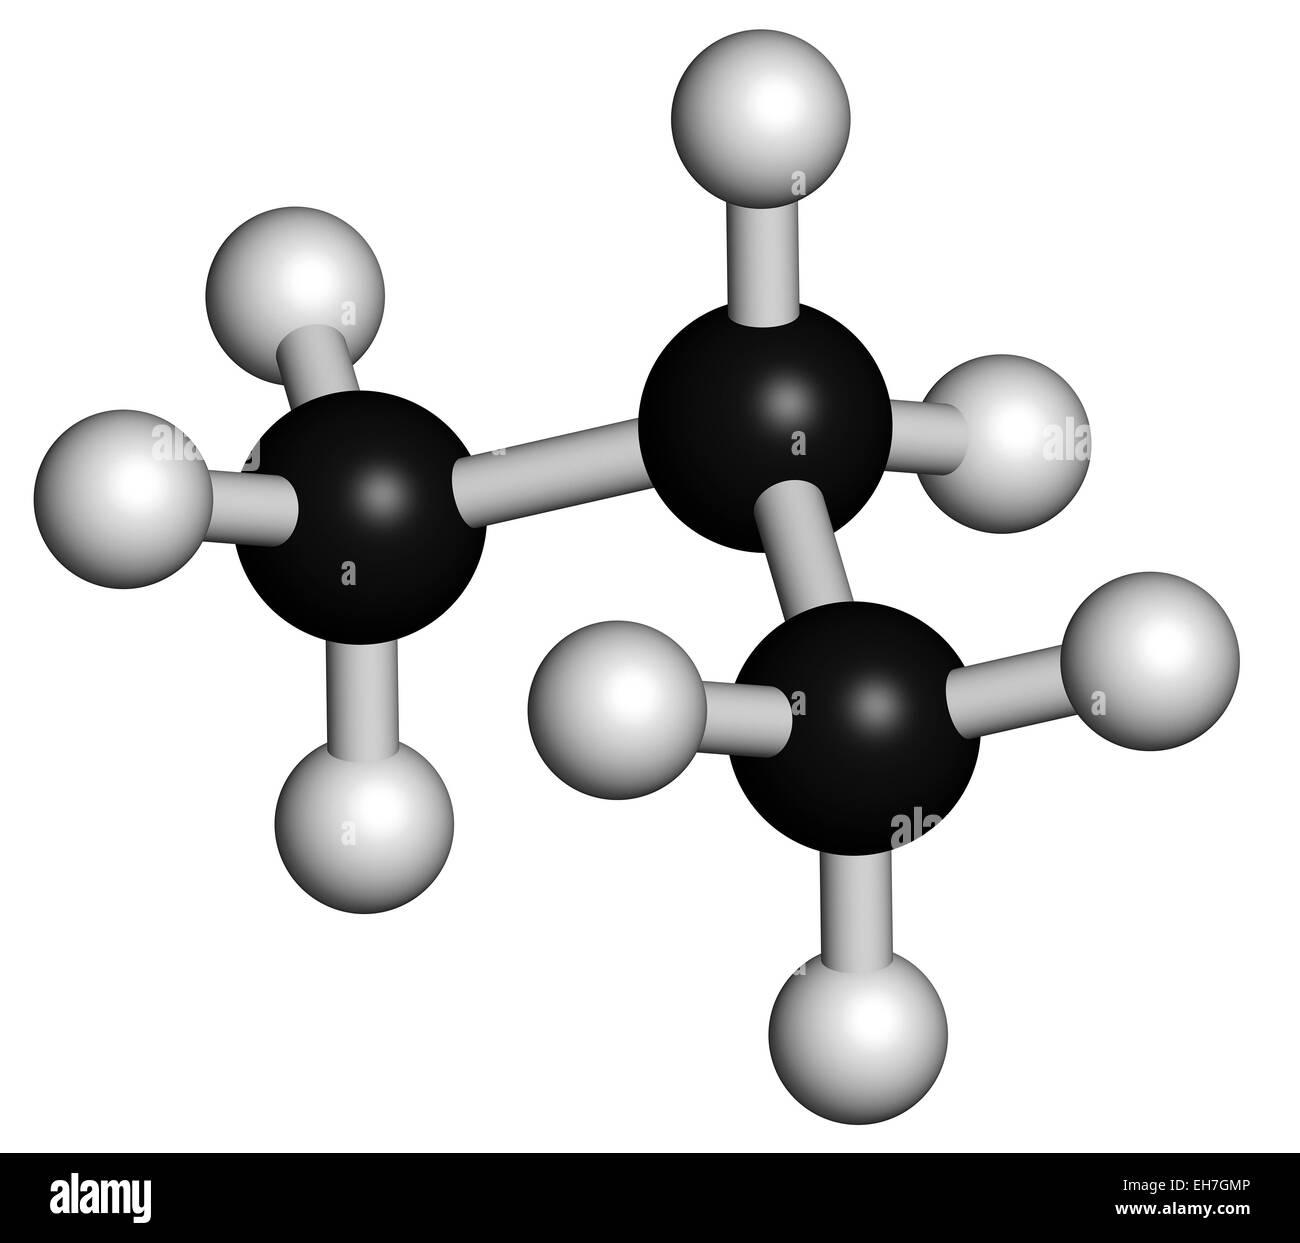 Propane Hydrocarbon Molecule Stock Photo 79457414 Alamy